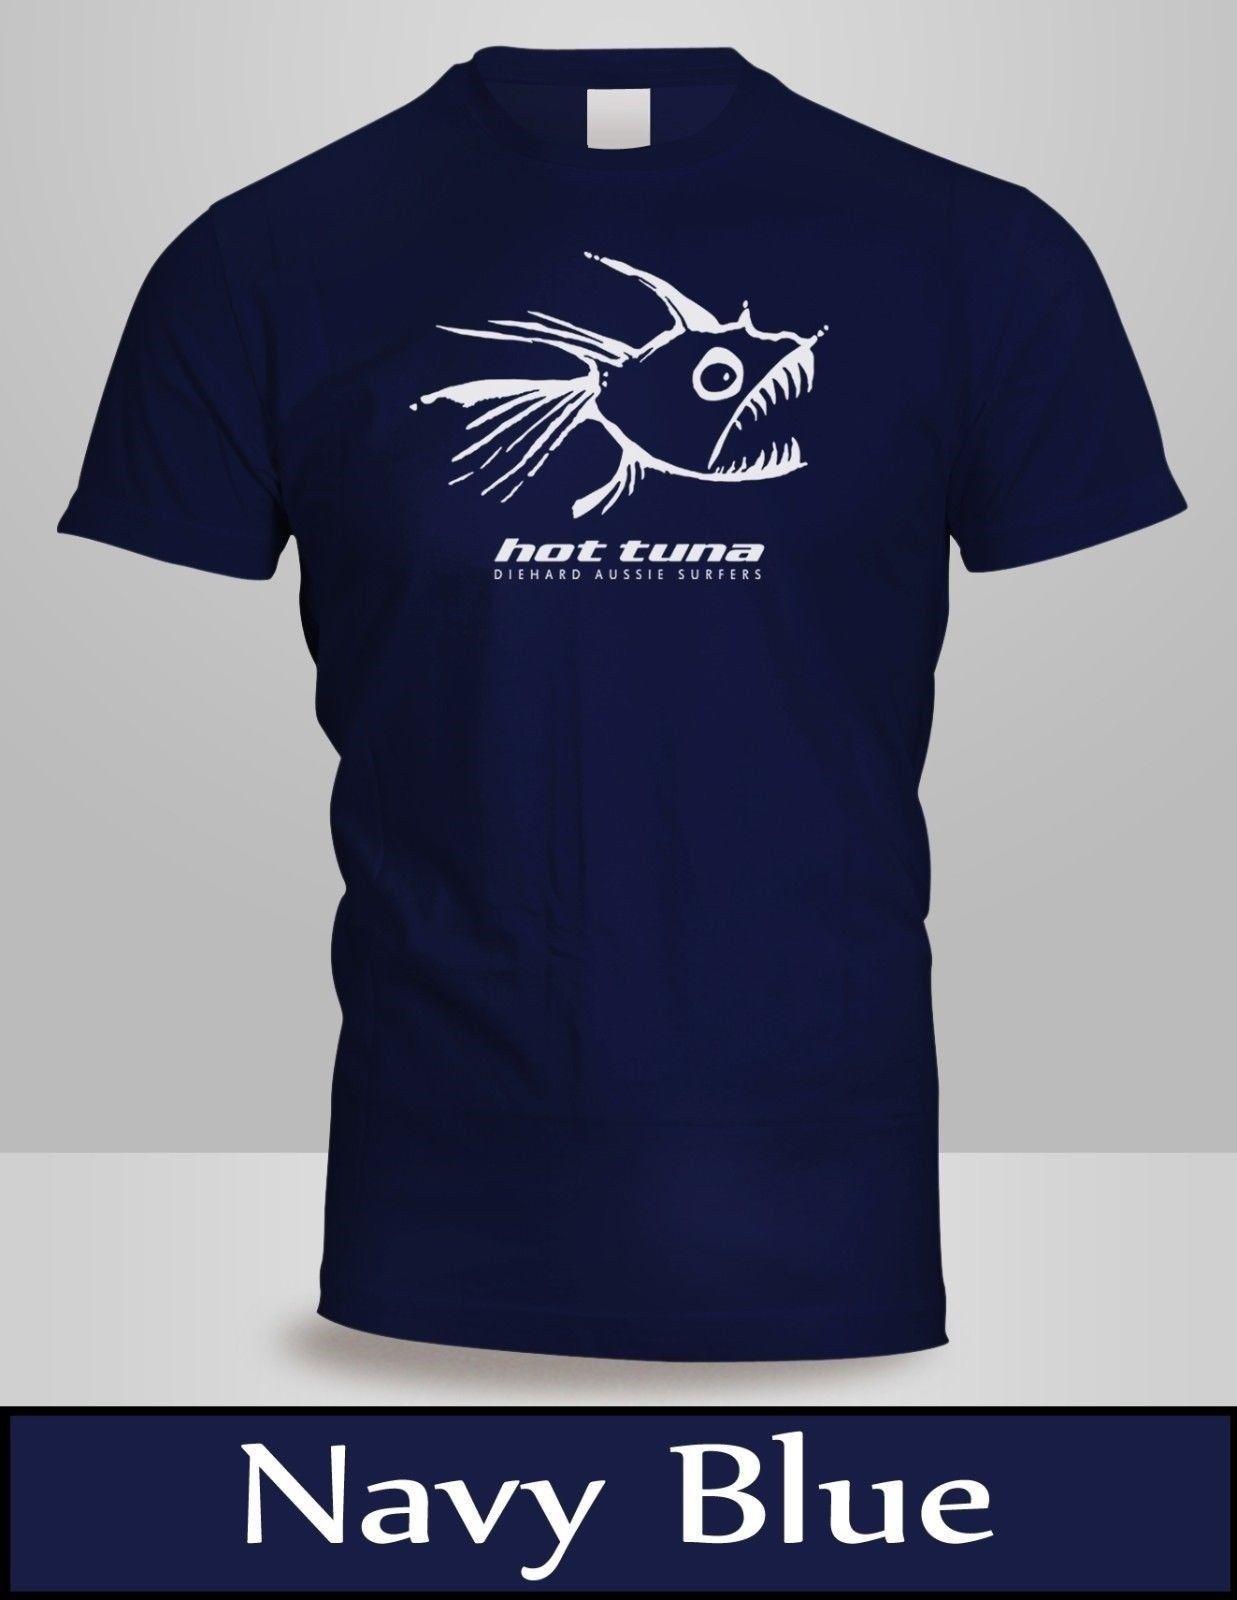 3687d7780 HOT TUNA T-SHIRT Men's Navy Blue TOP Shirt New 2 Cool Casual pride t shirt  men Unisex New Fashion